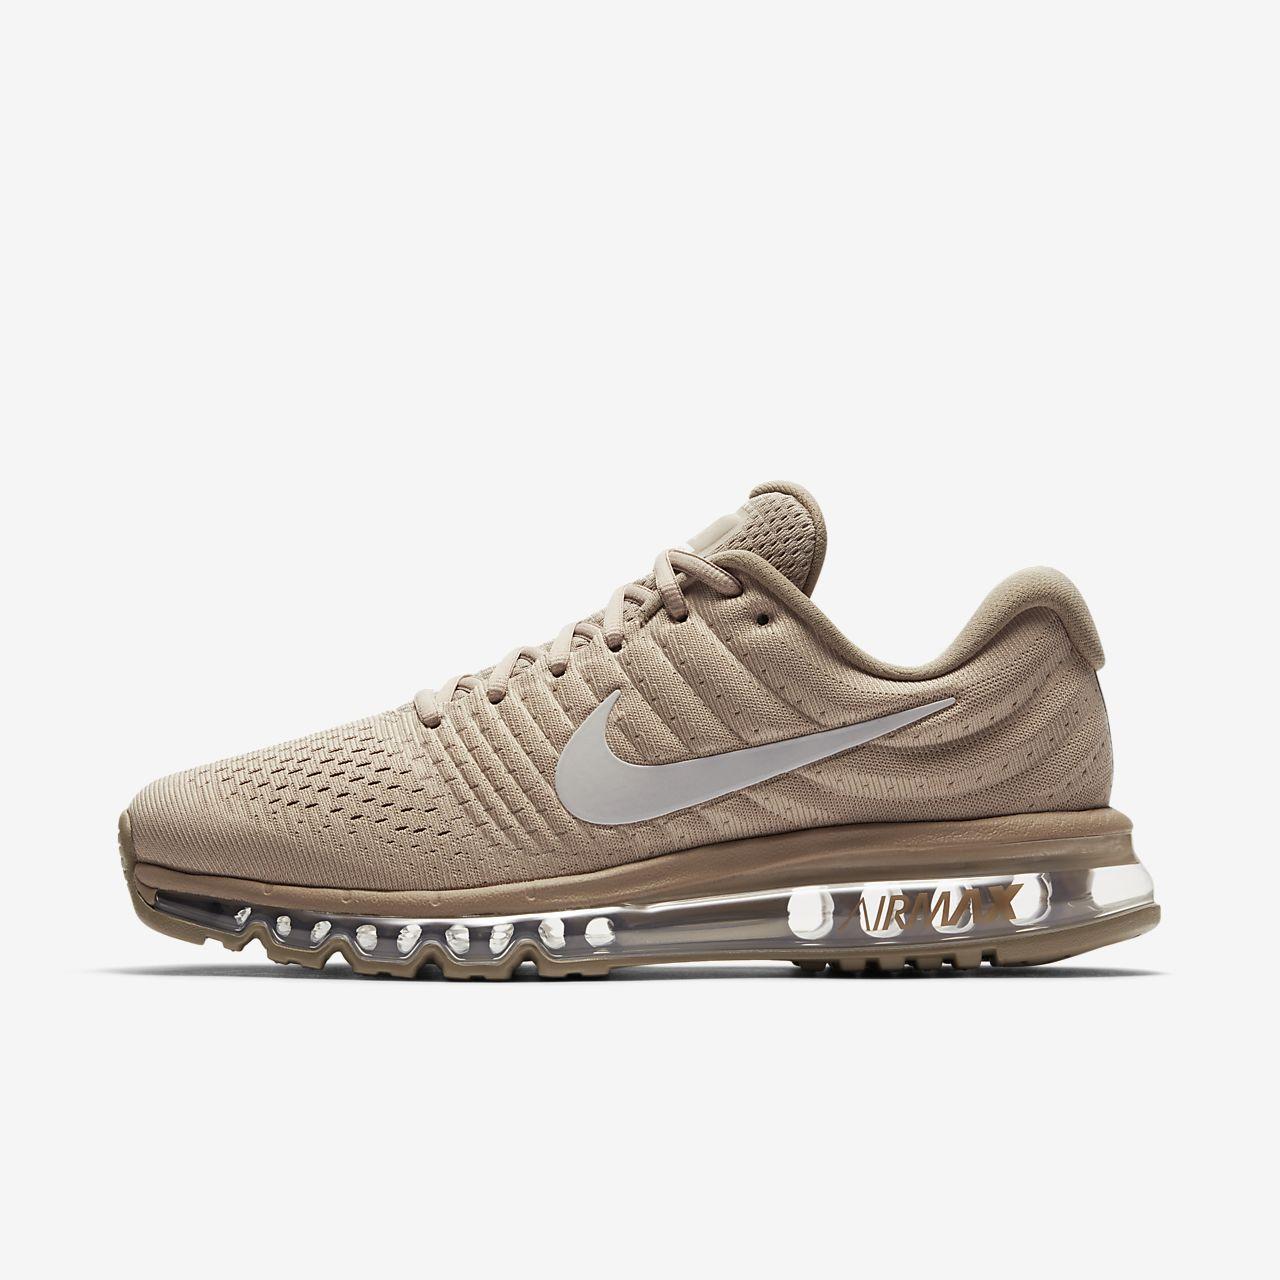 the nike air max 2017 men's running shoe